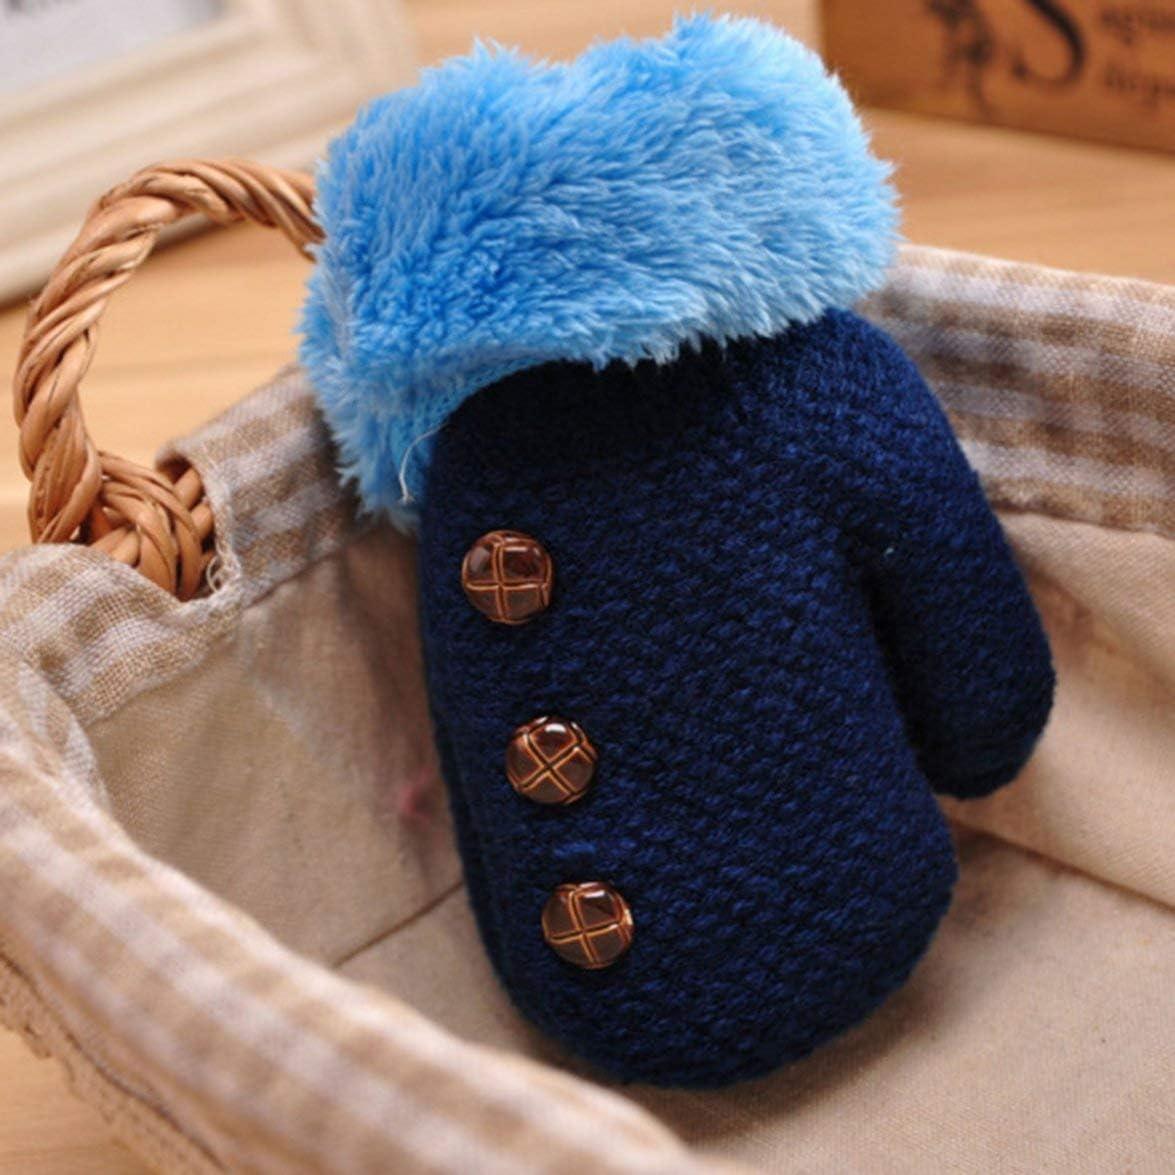 Kinder warme Handschuhe Jungen und M/ädchen Handschuhe Baby All Cover Finger Handschuhe Winterhandschuhe Double Thickened Buttons Dekoration dunkelblau